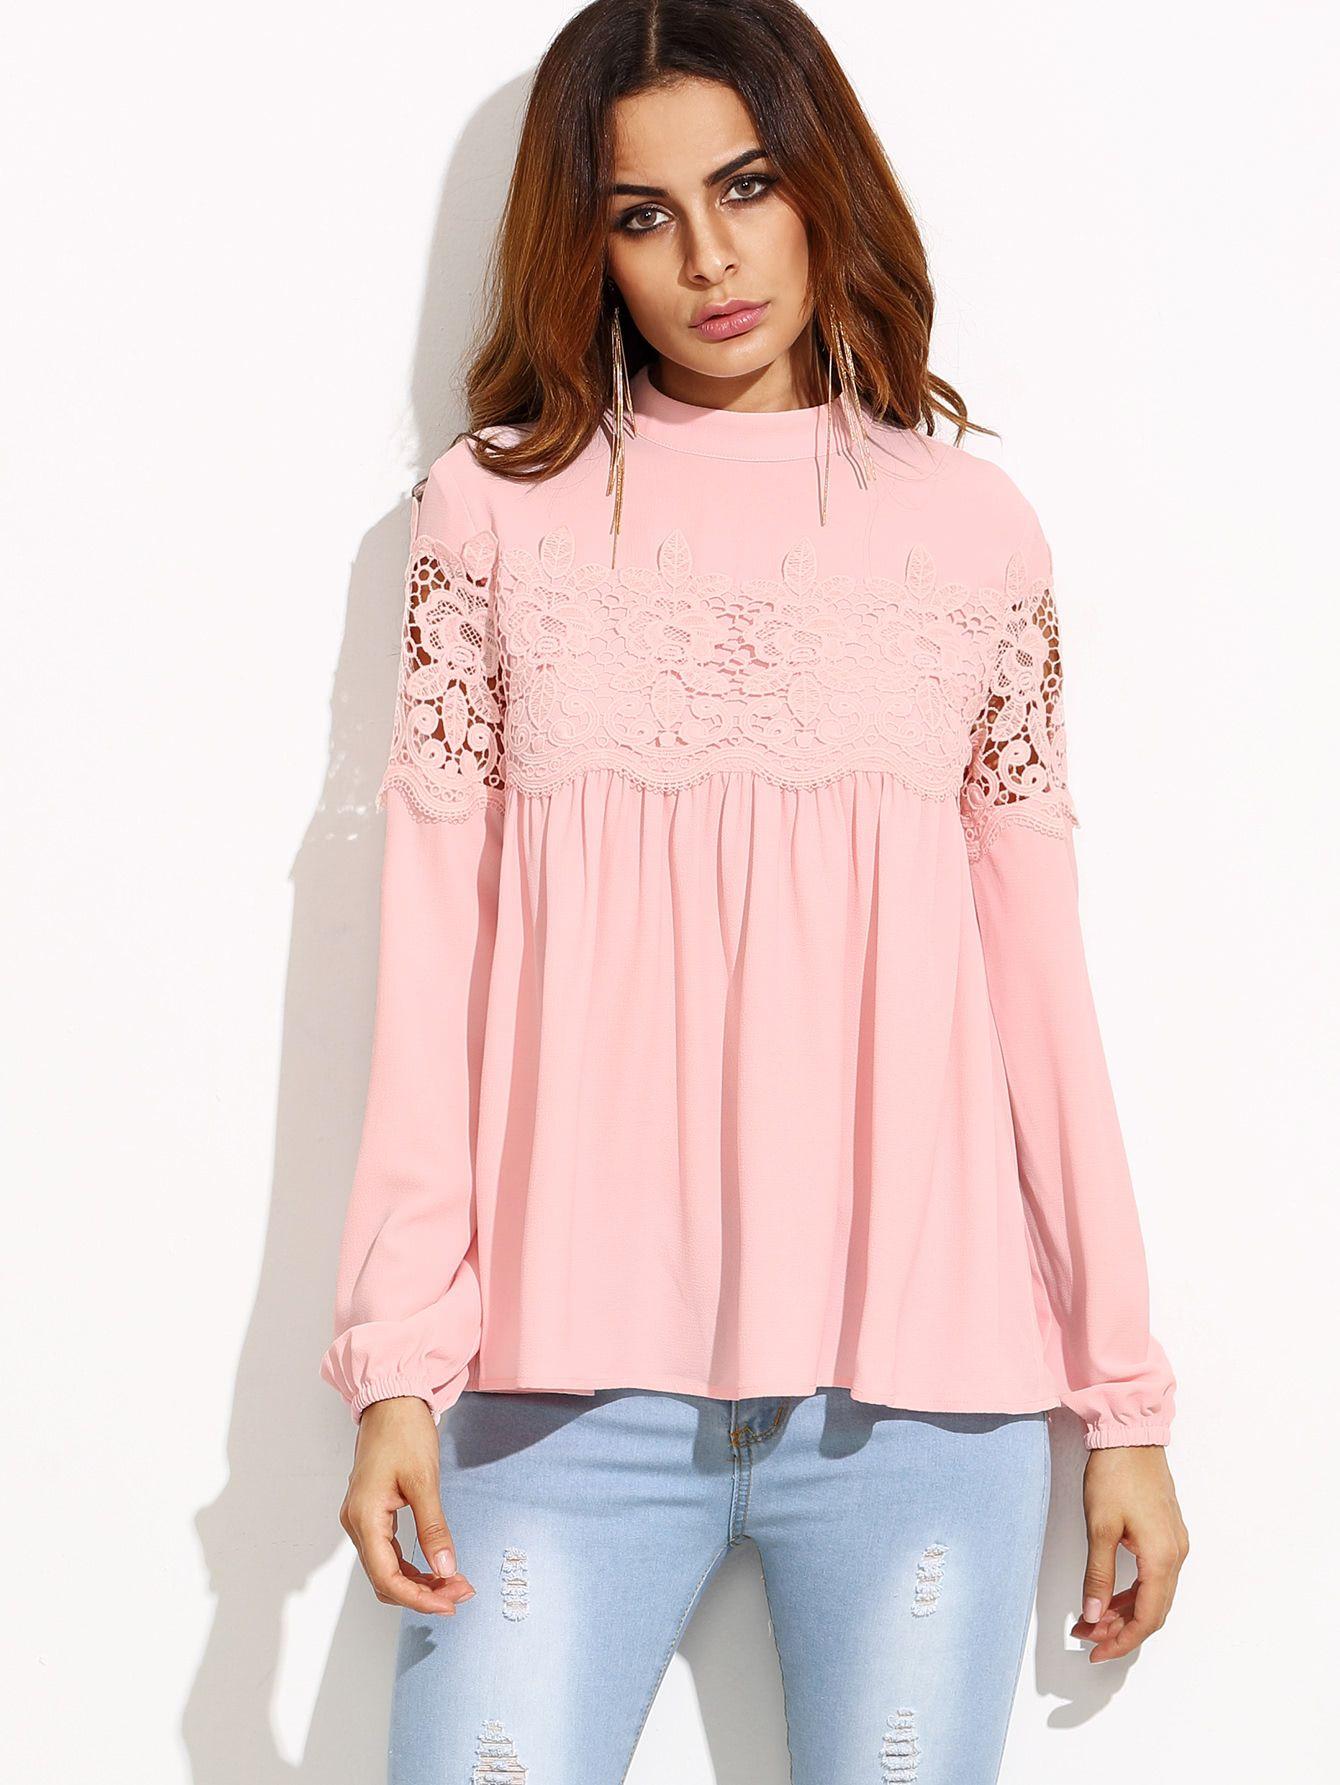 5e7fe8bc435 Pink Lace Shirts